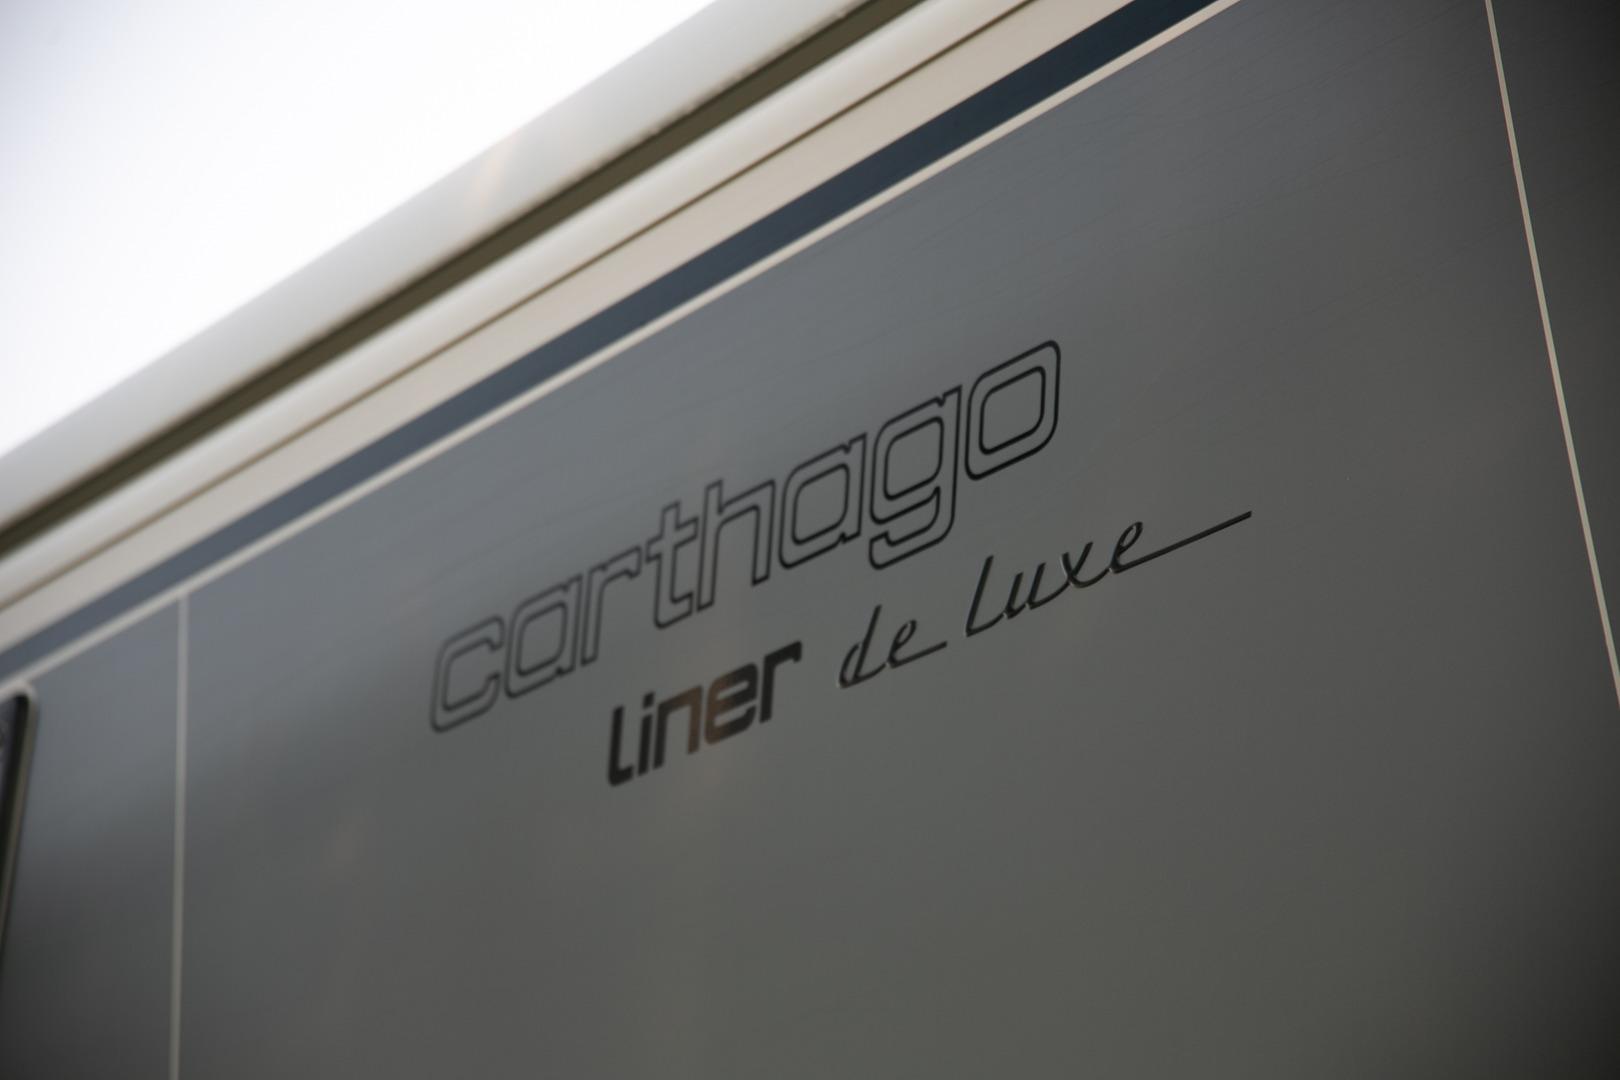 MAN-Carthago LINER 82Q PKW